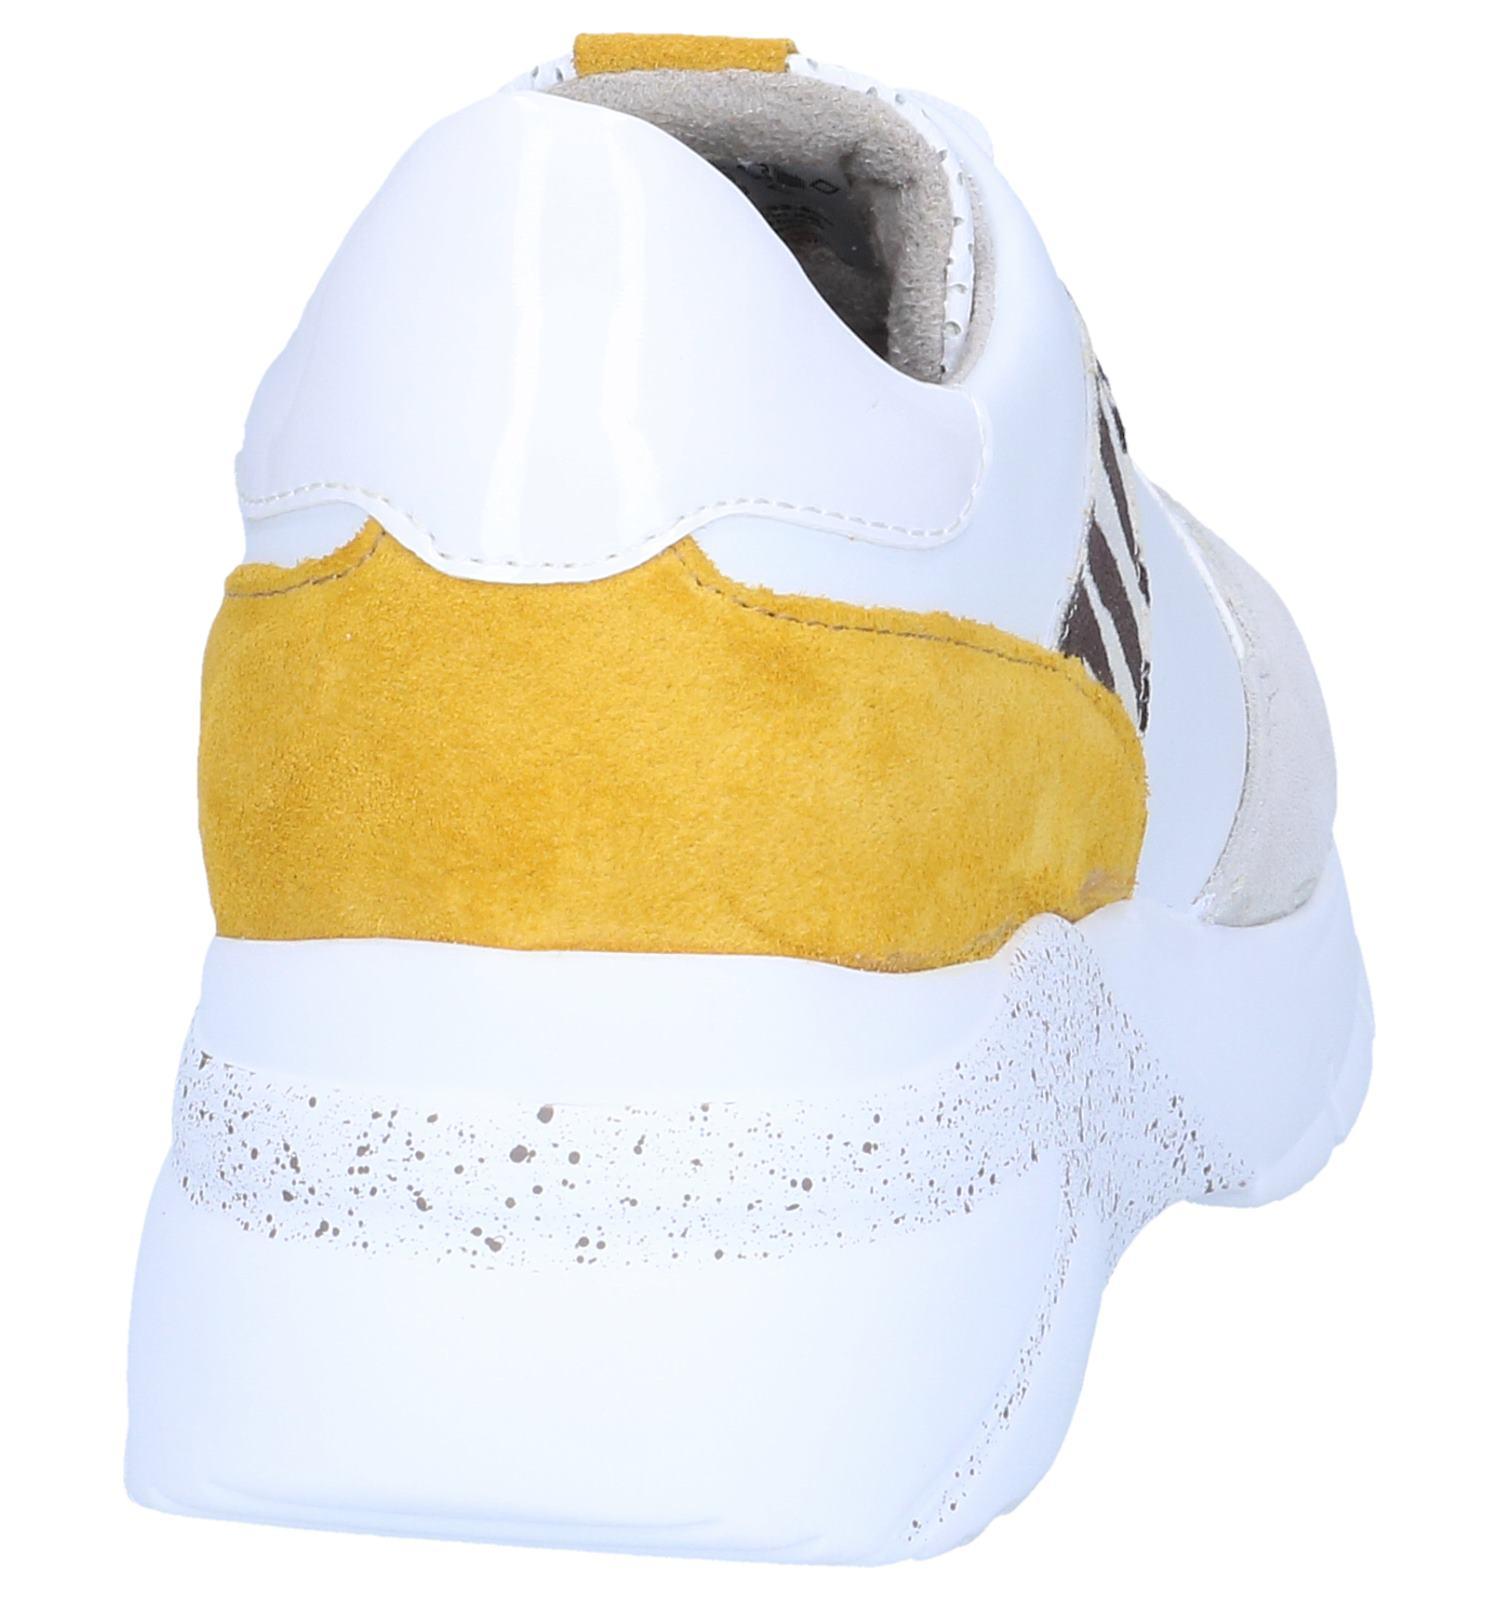 Sneakers Tamaris Sneakers Witte Sneakers Tamaris Sneakers Witte Witte Tamaris Witte Tamaris 8kNnwPOX0